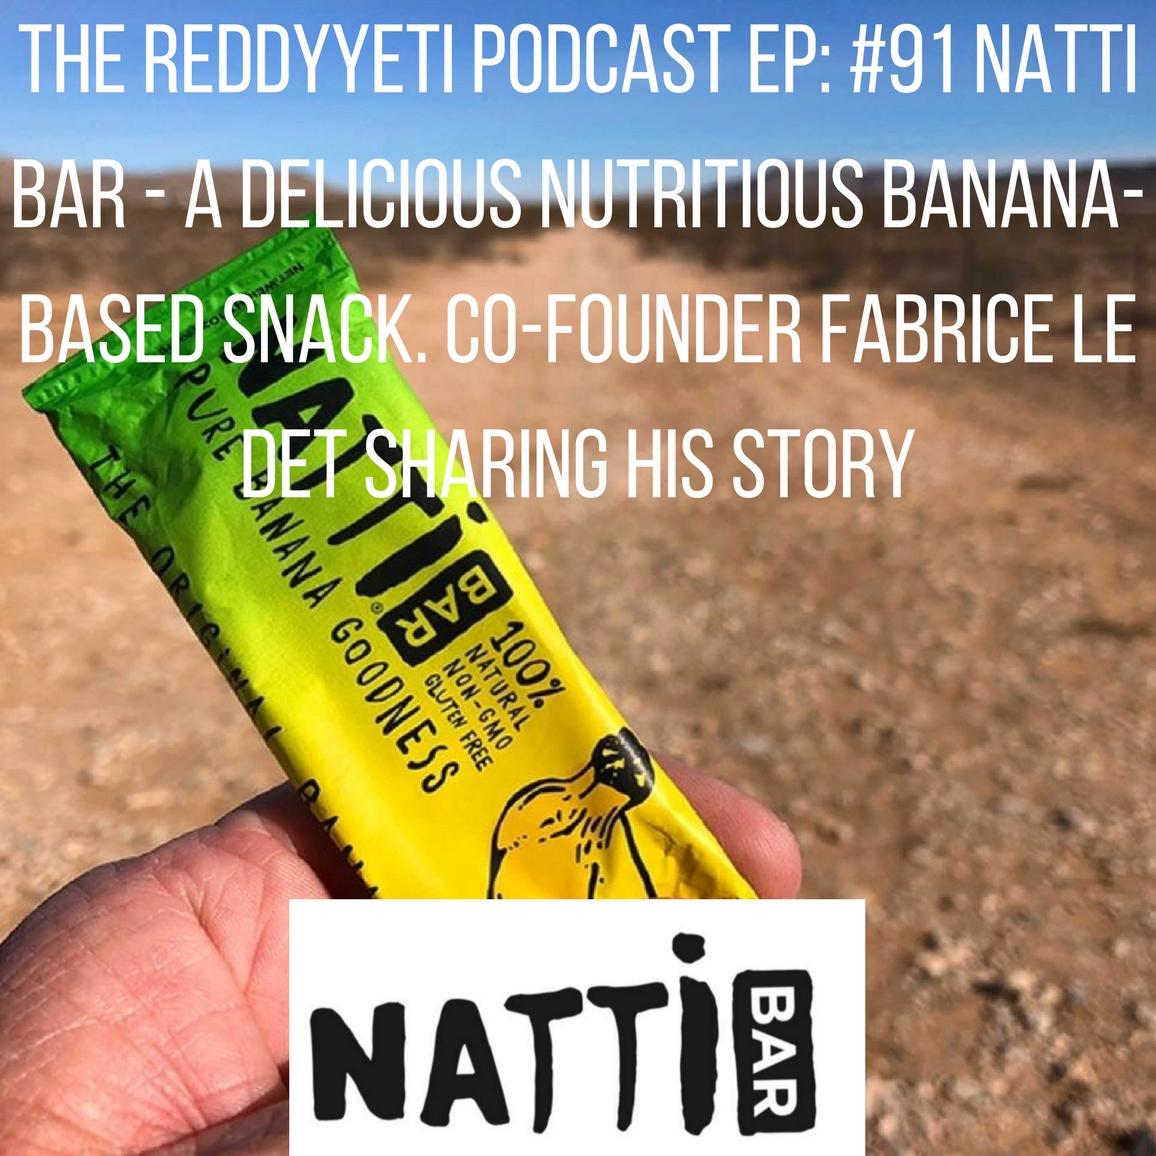 Natti Bar Podcast Image (2).jpg